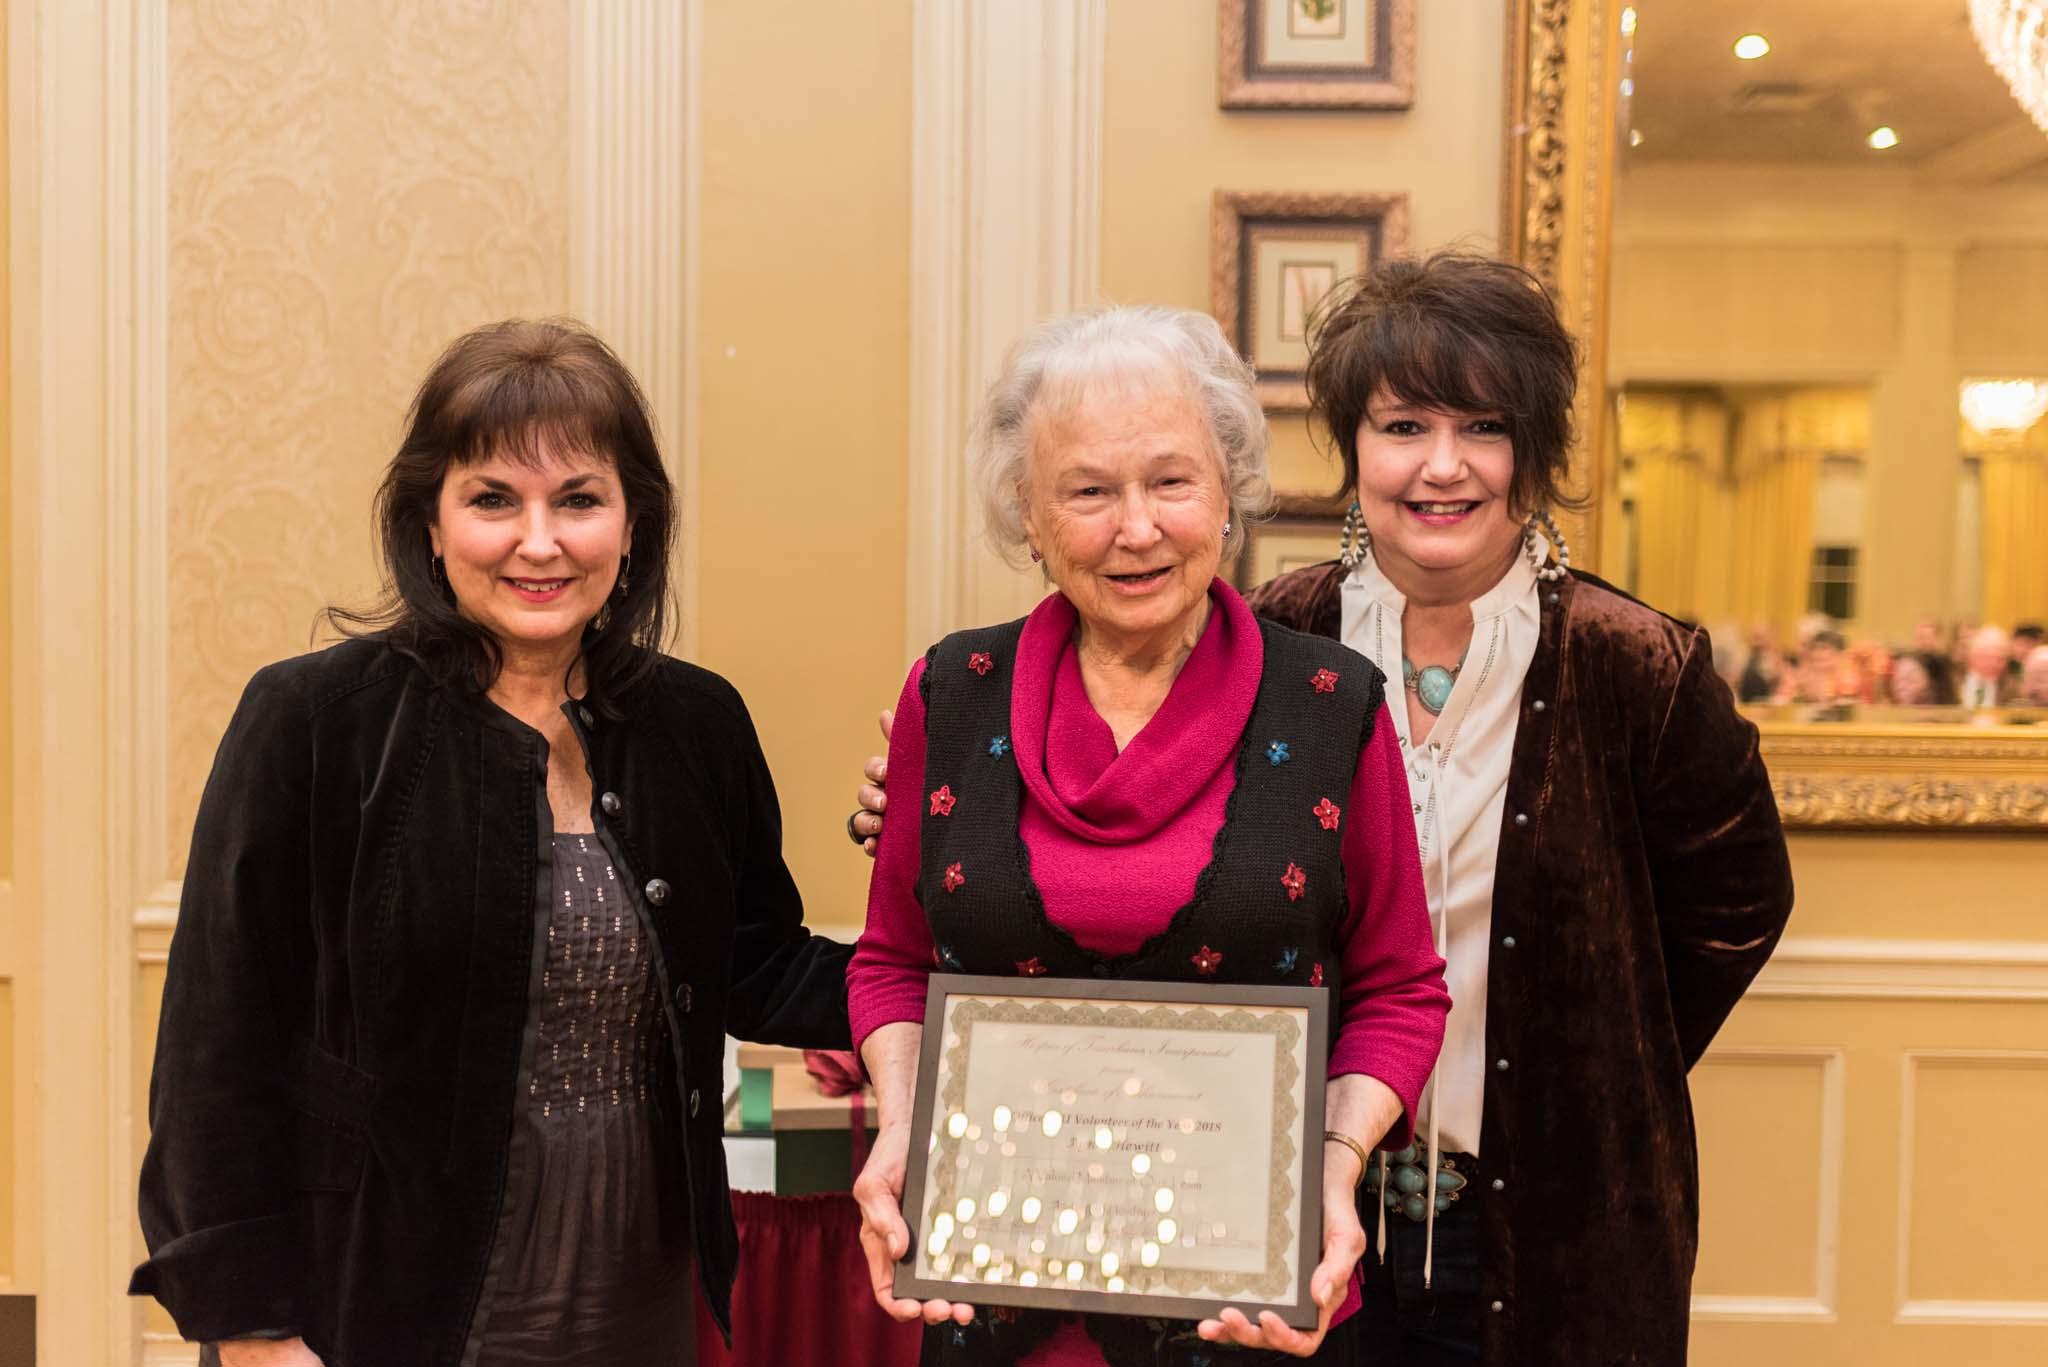 Cindy Marsh, Agnes Hewett and Debra Morse